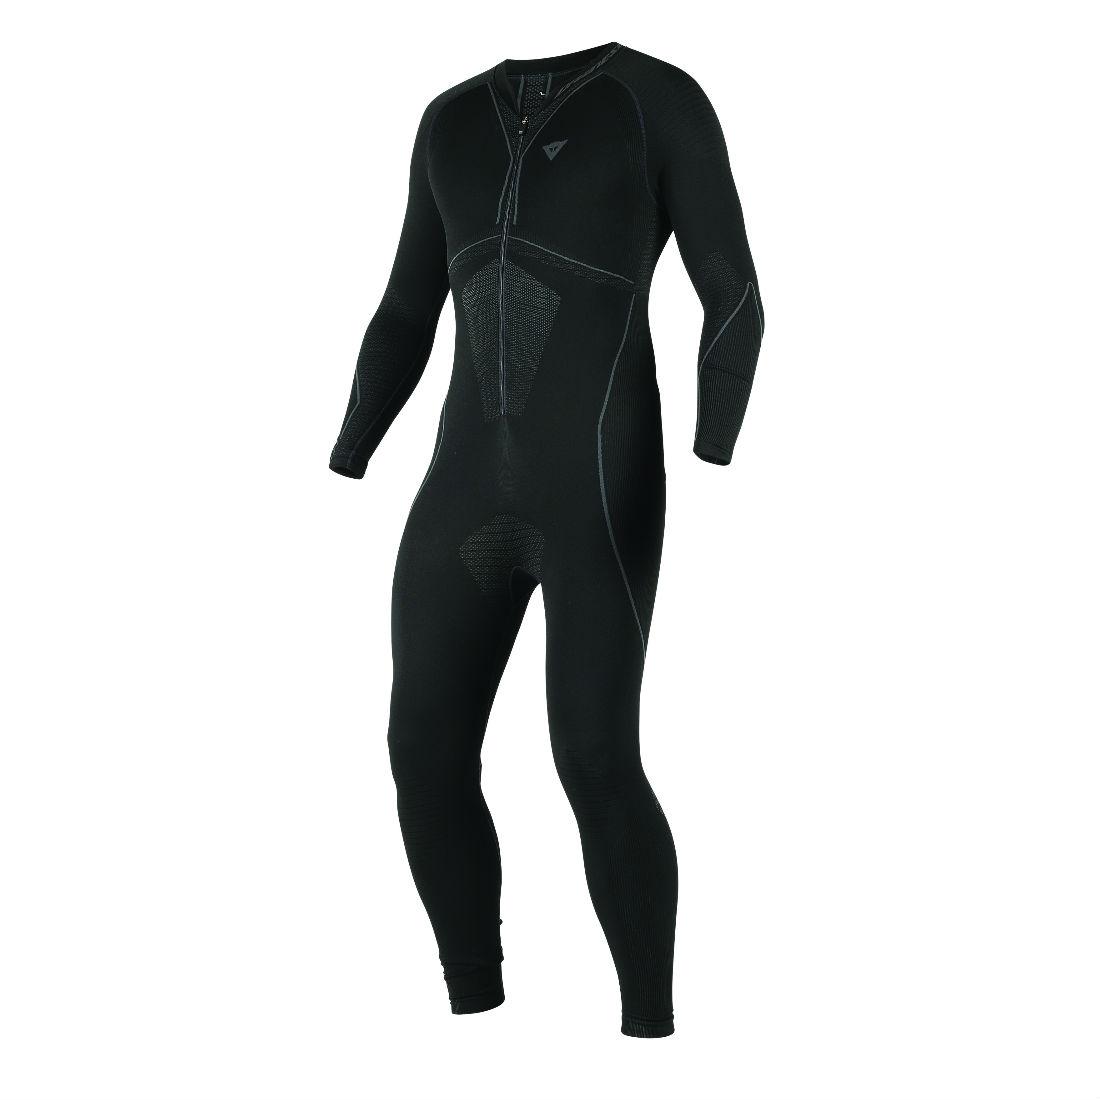 【DAINESE】D-CORE    DRY 連身內穿套裝 - 「Webike-摩托百貨」